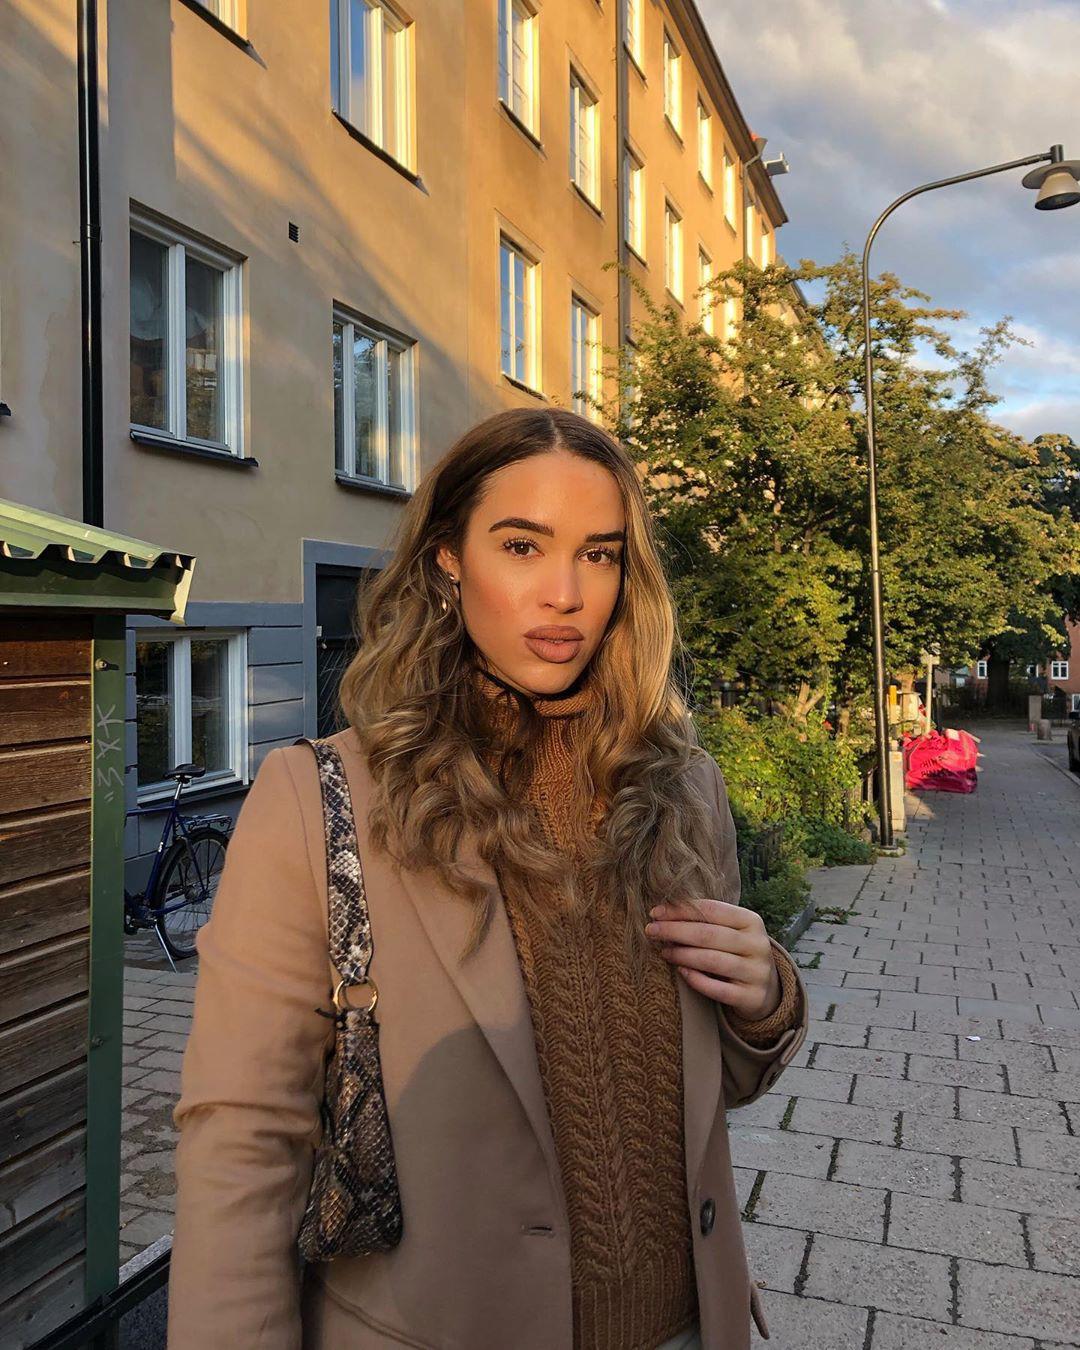 Isabelle Tounsi girls instagram photos, natural blong hairs, Hair Style